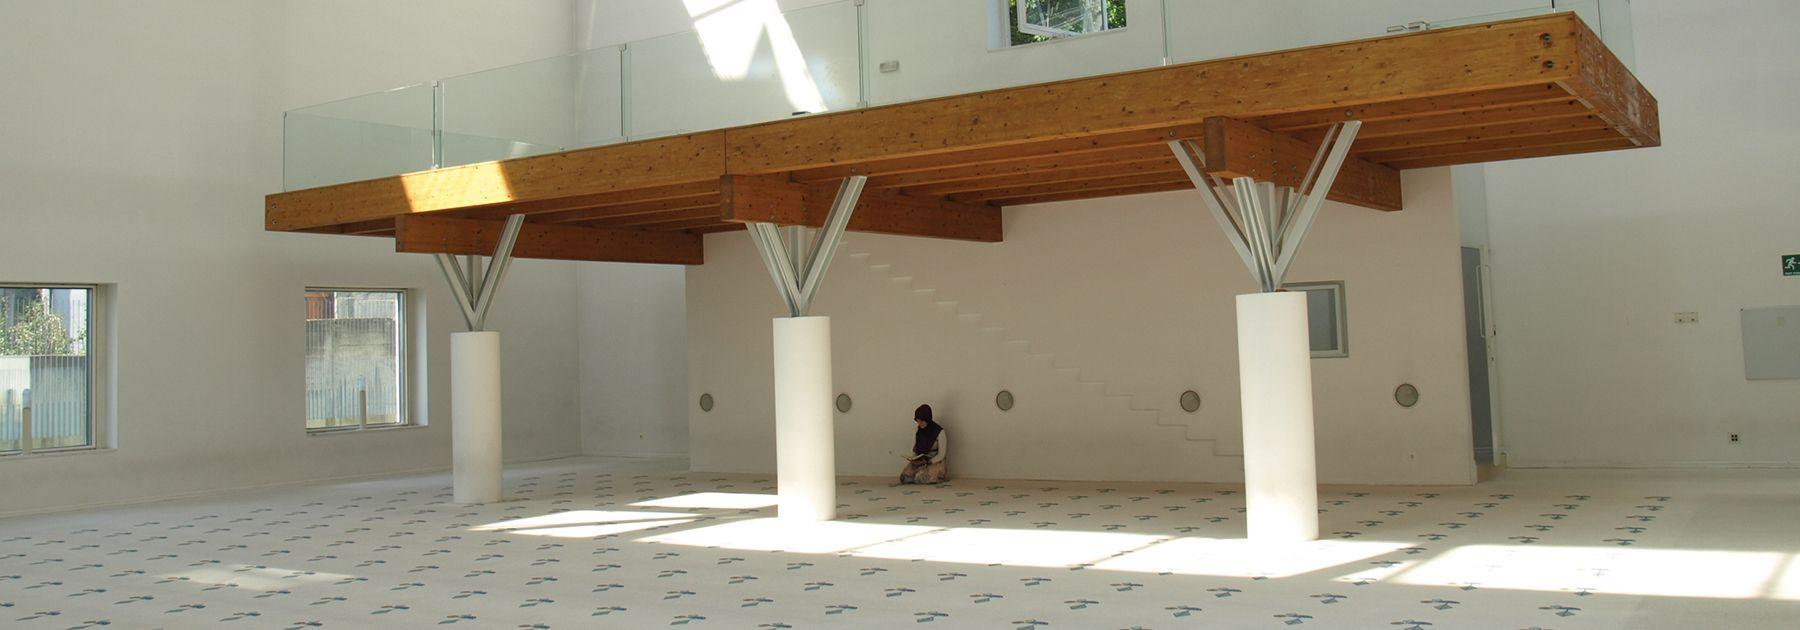 Behram Bey's madrasah mosque